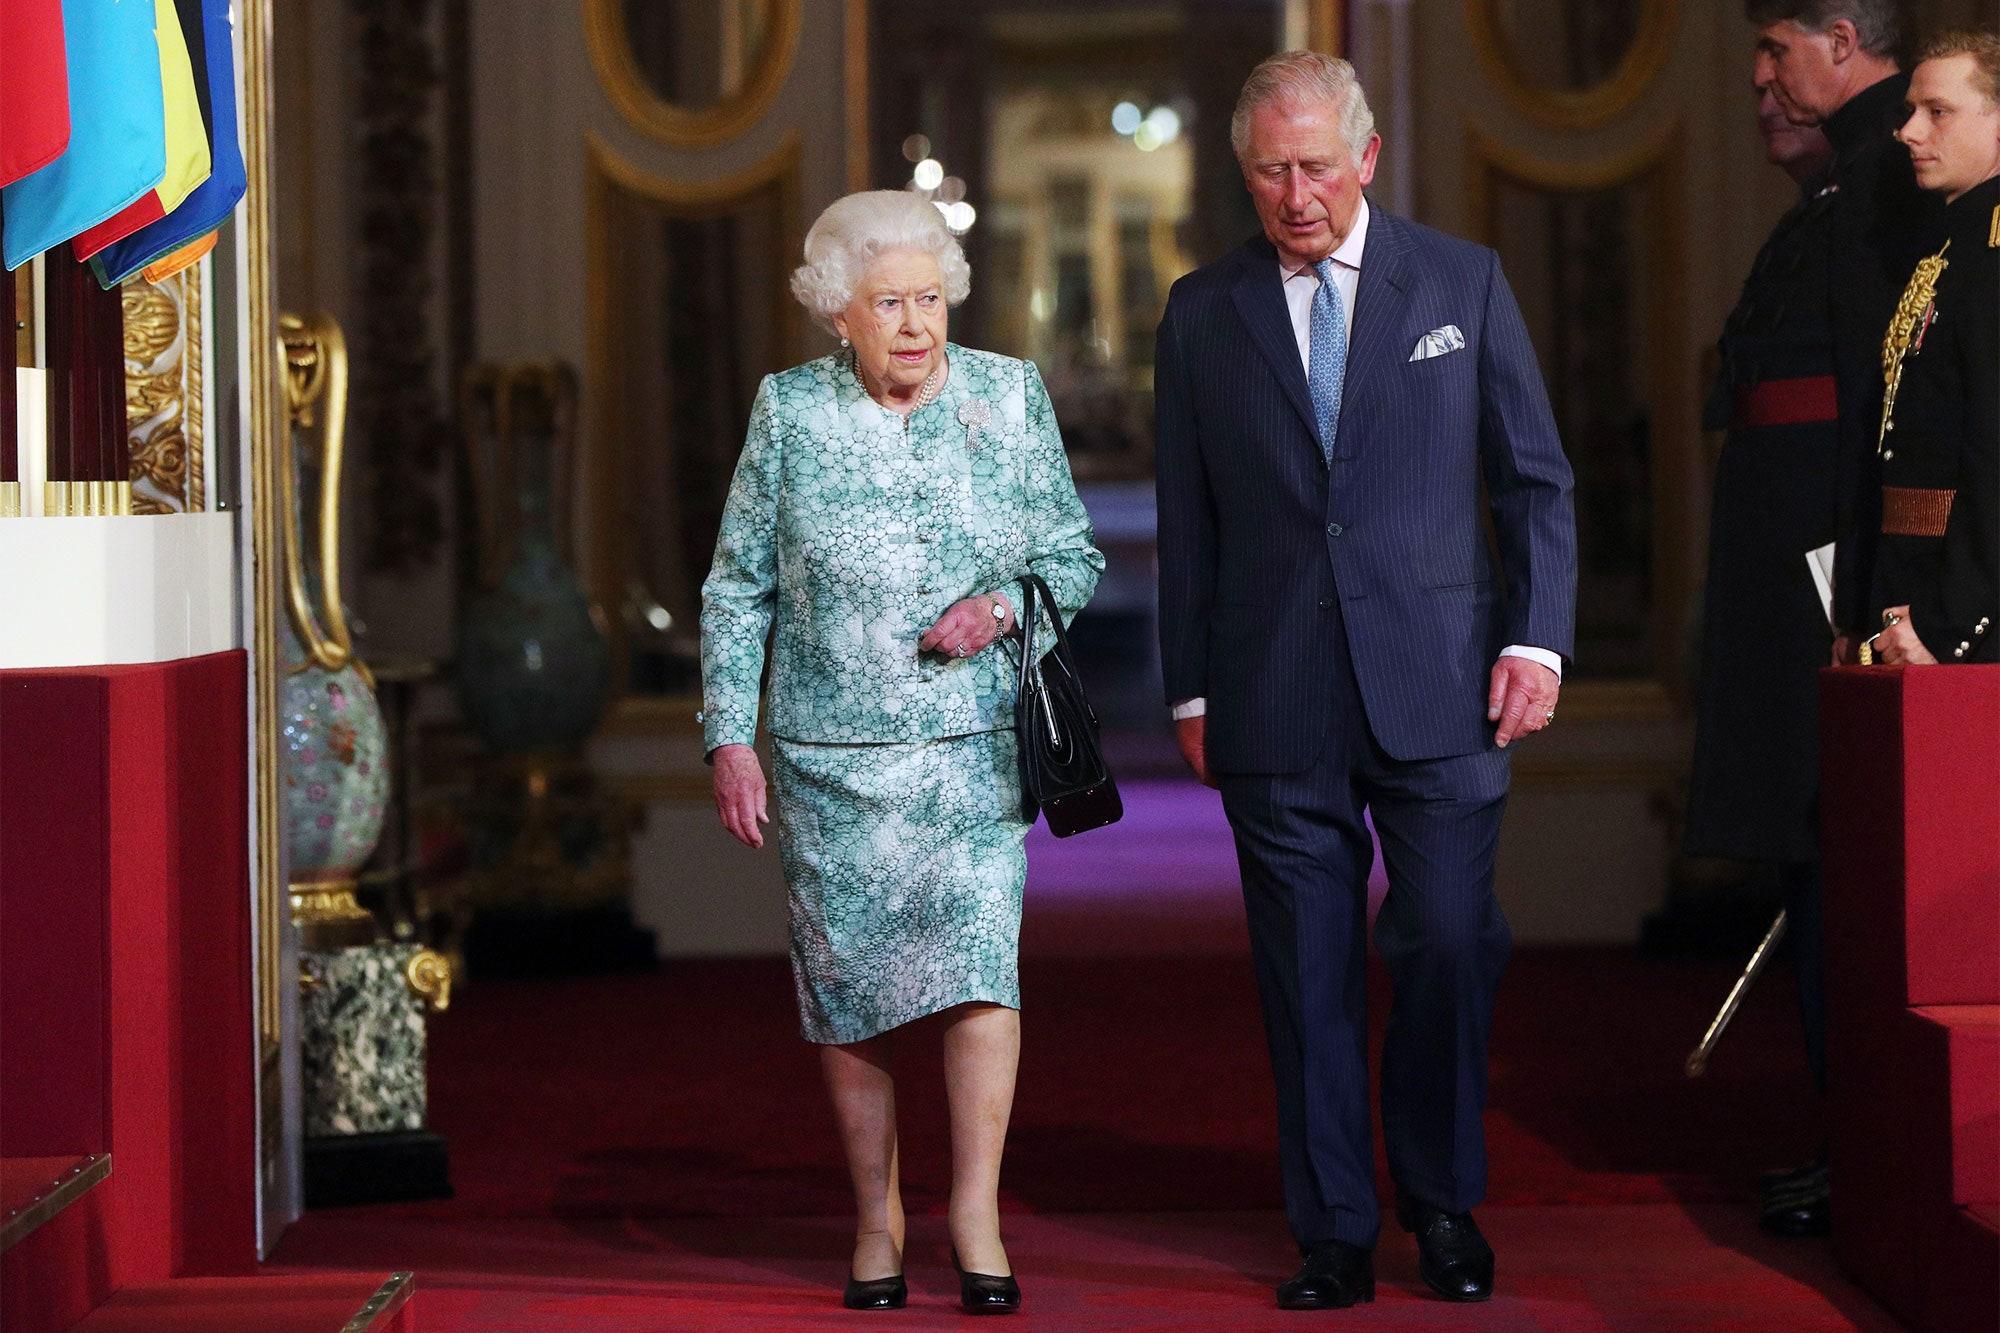 PunjabKesari, Nari, Queen Elizabeth II